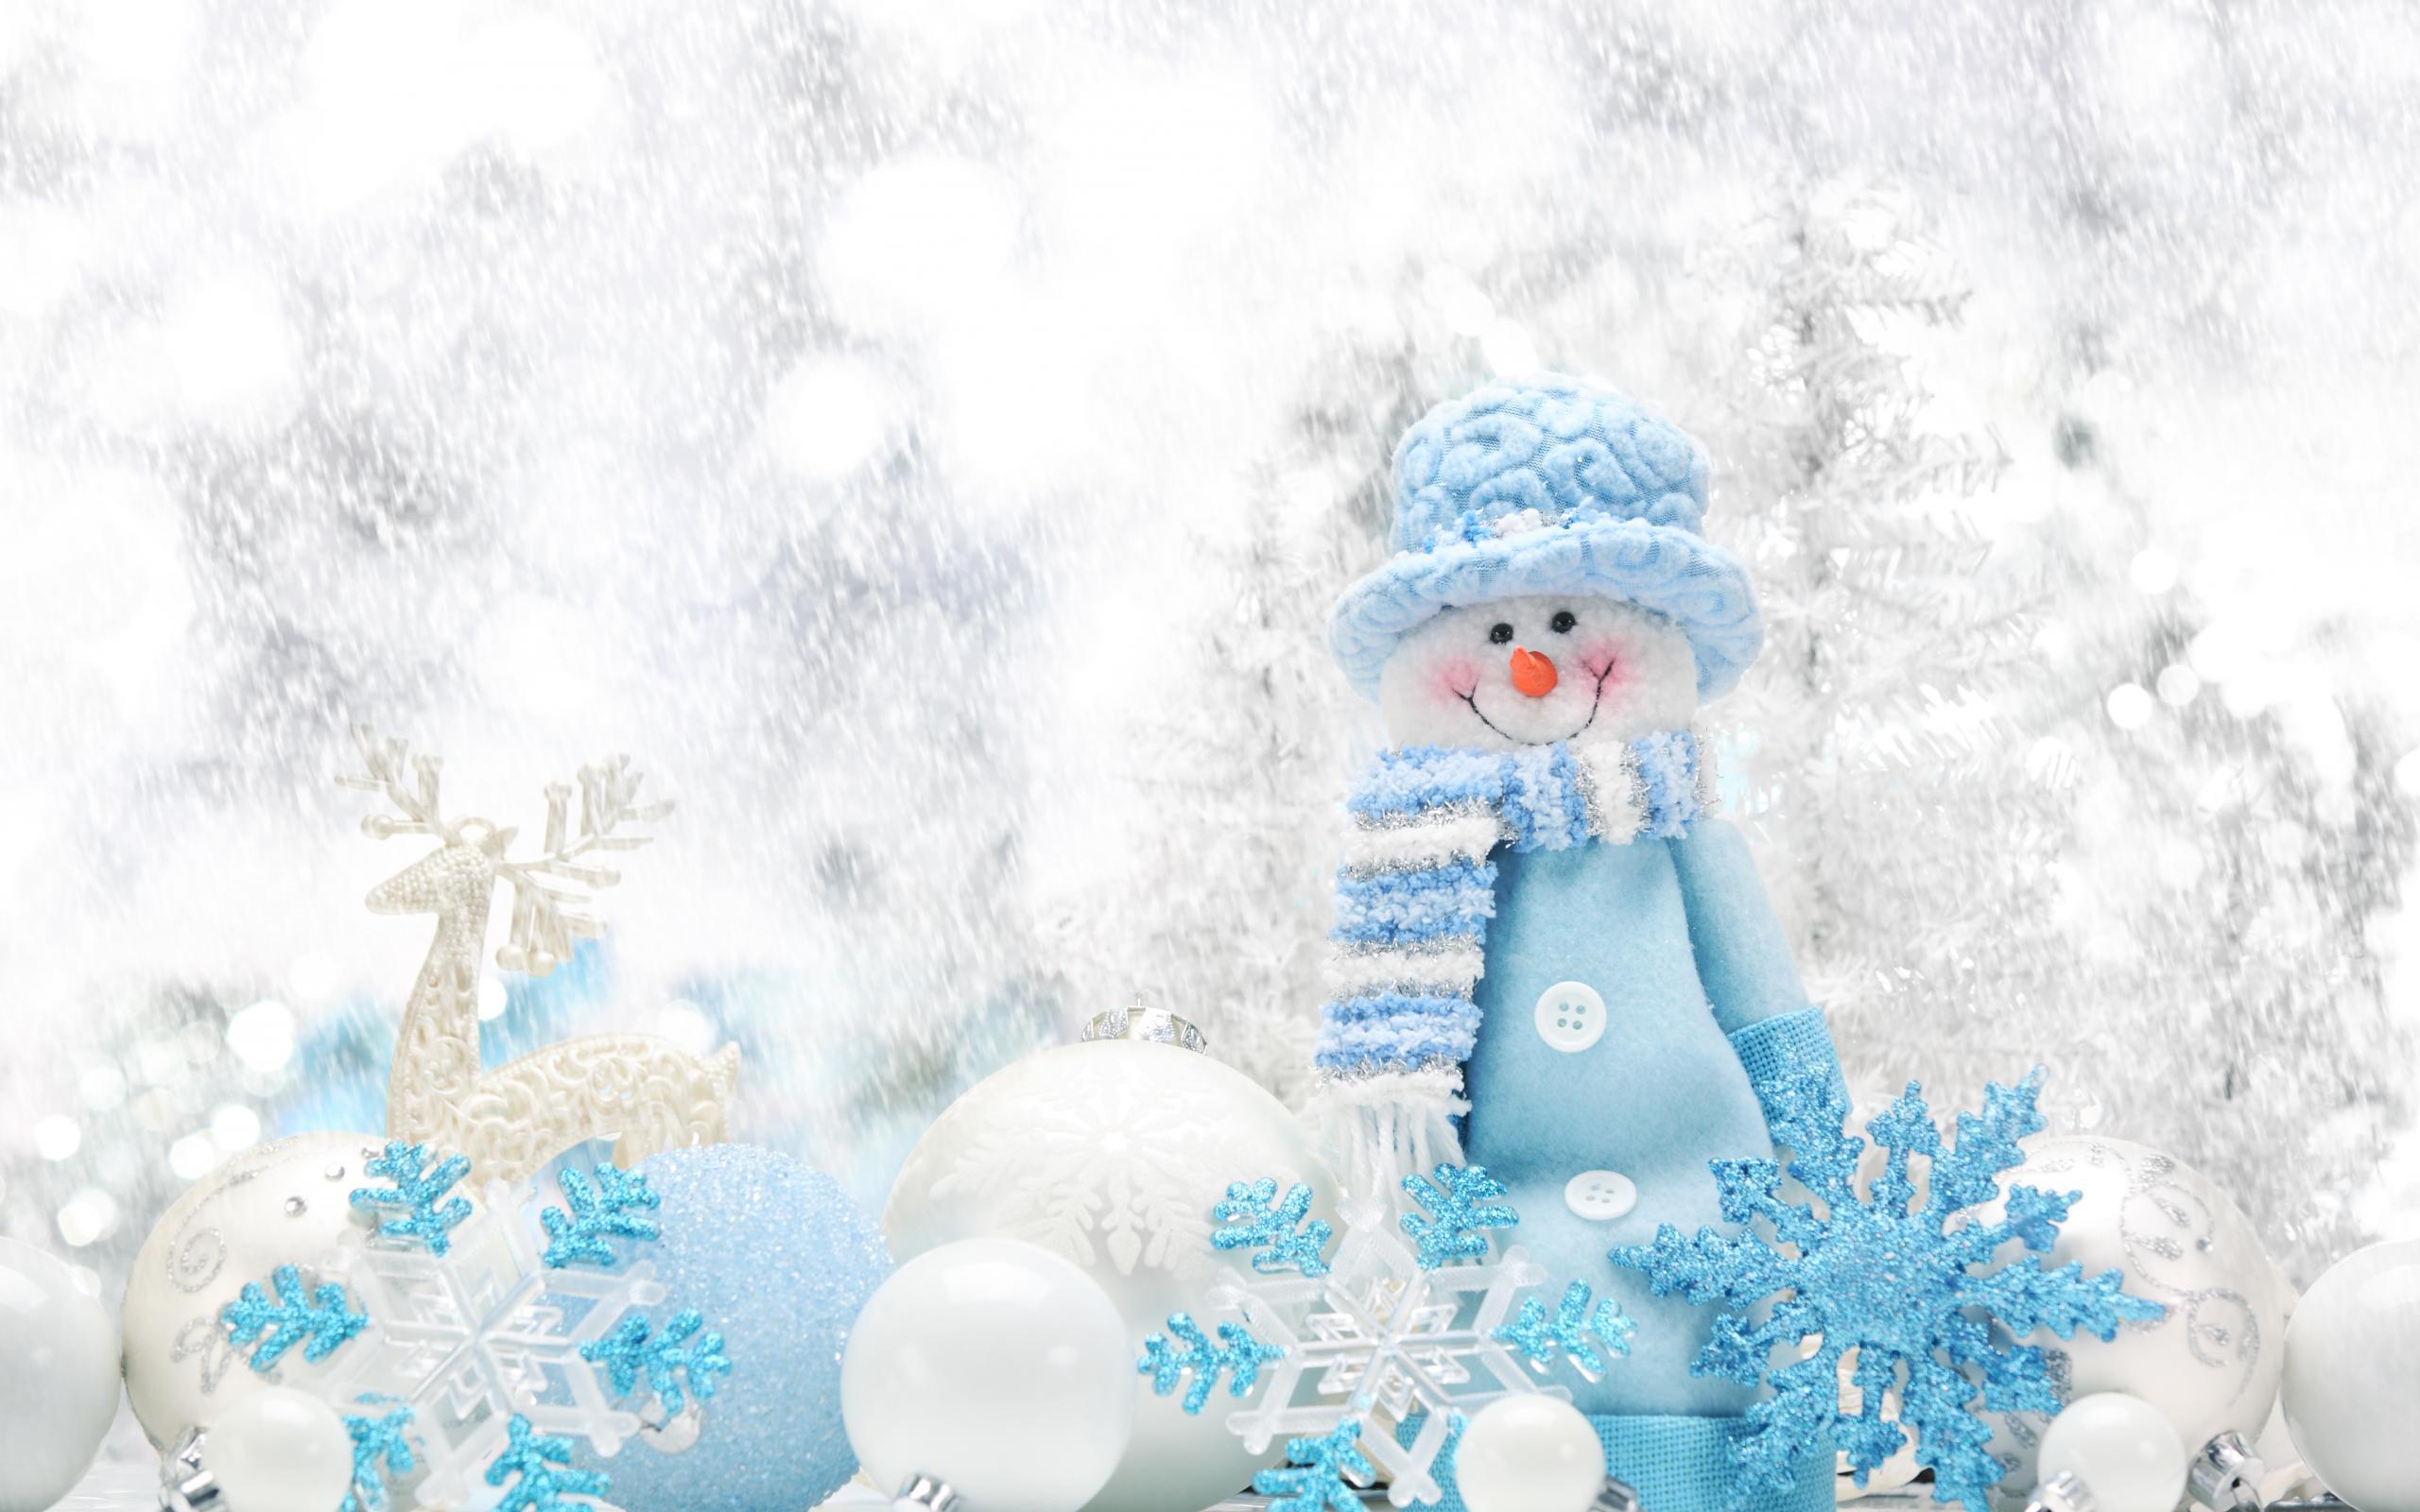 Christmas Christmas Ornaments Snowman Holiday Blue White Snowflake Snow 2560x1600